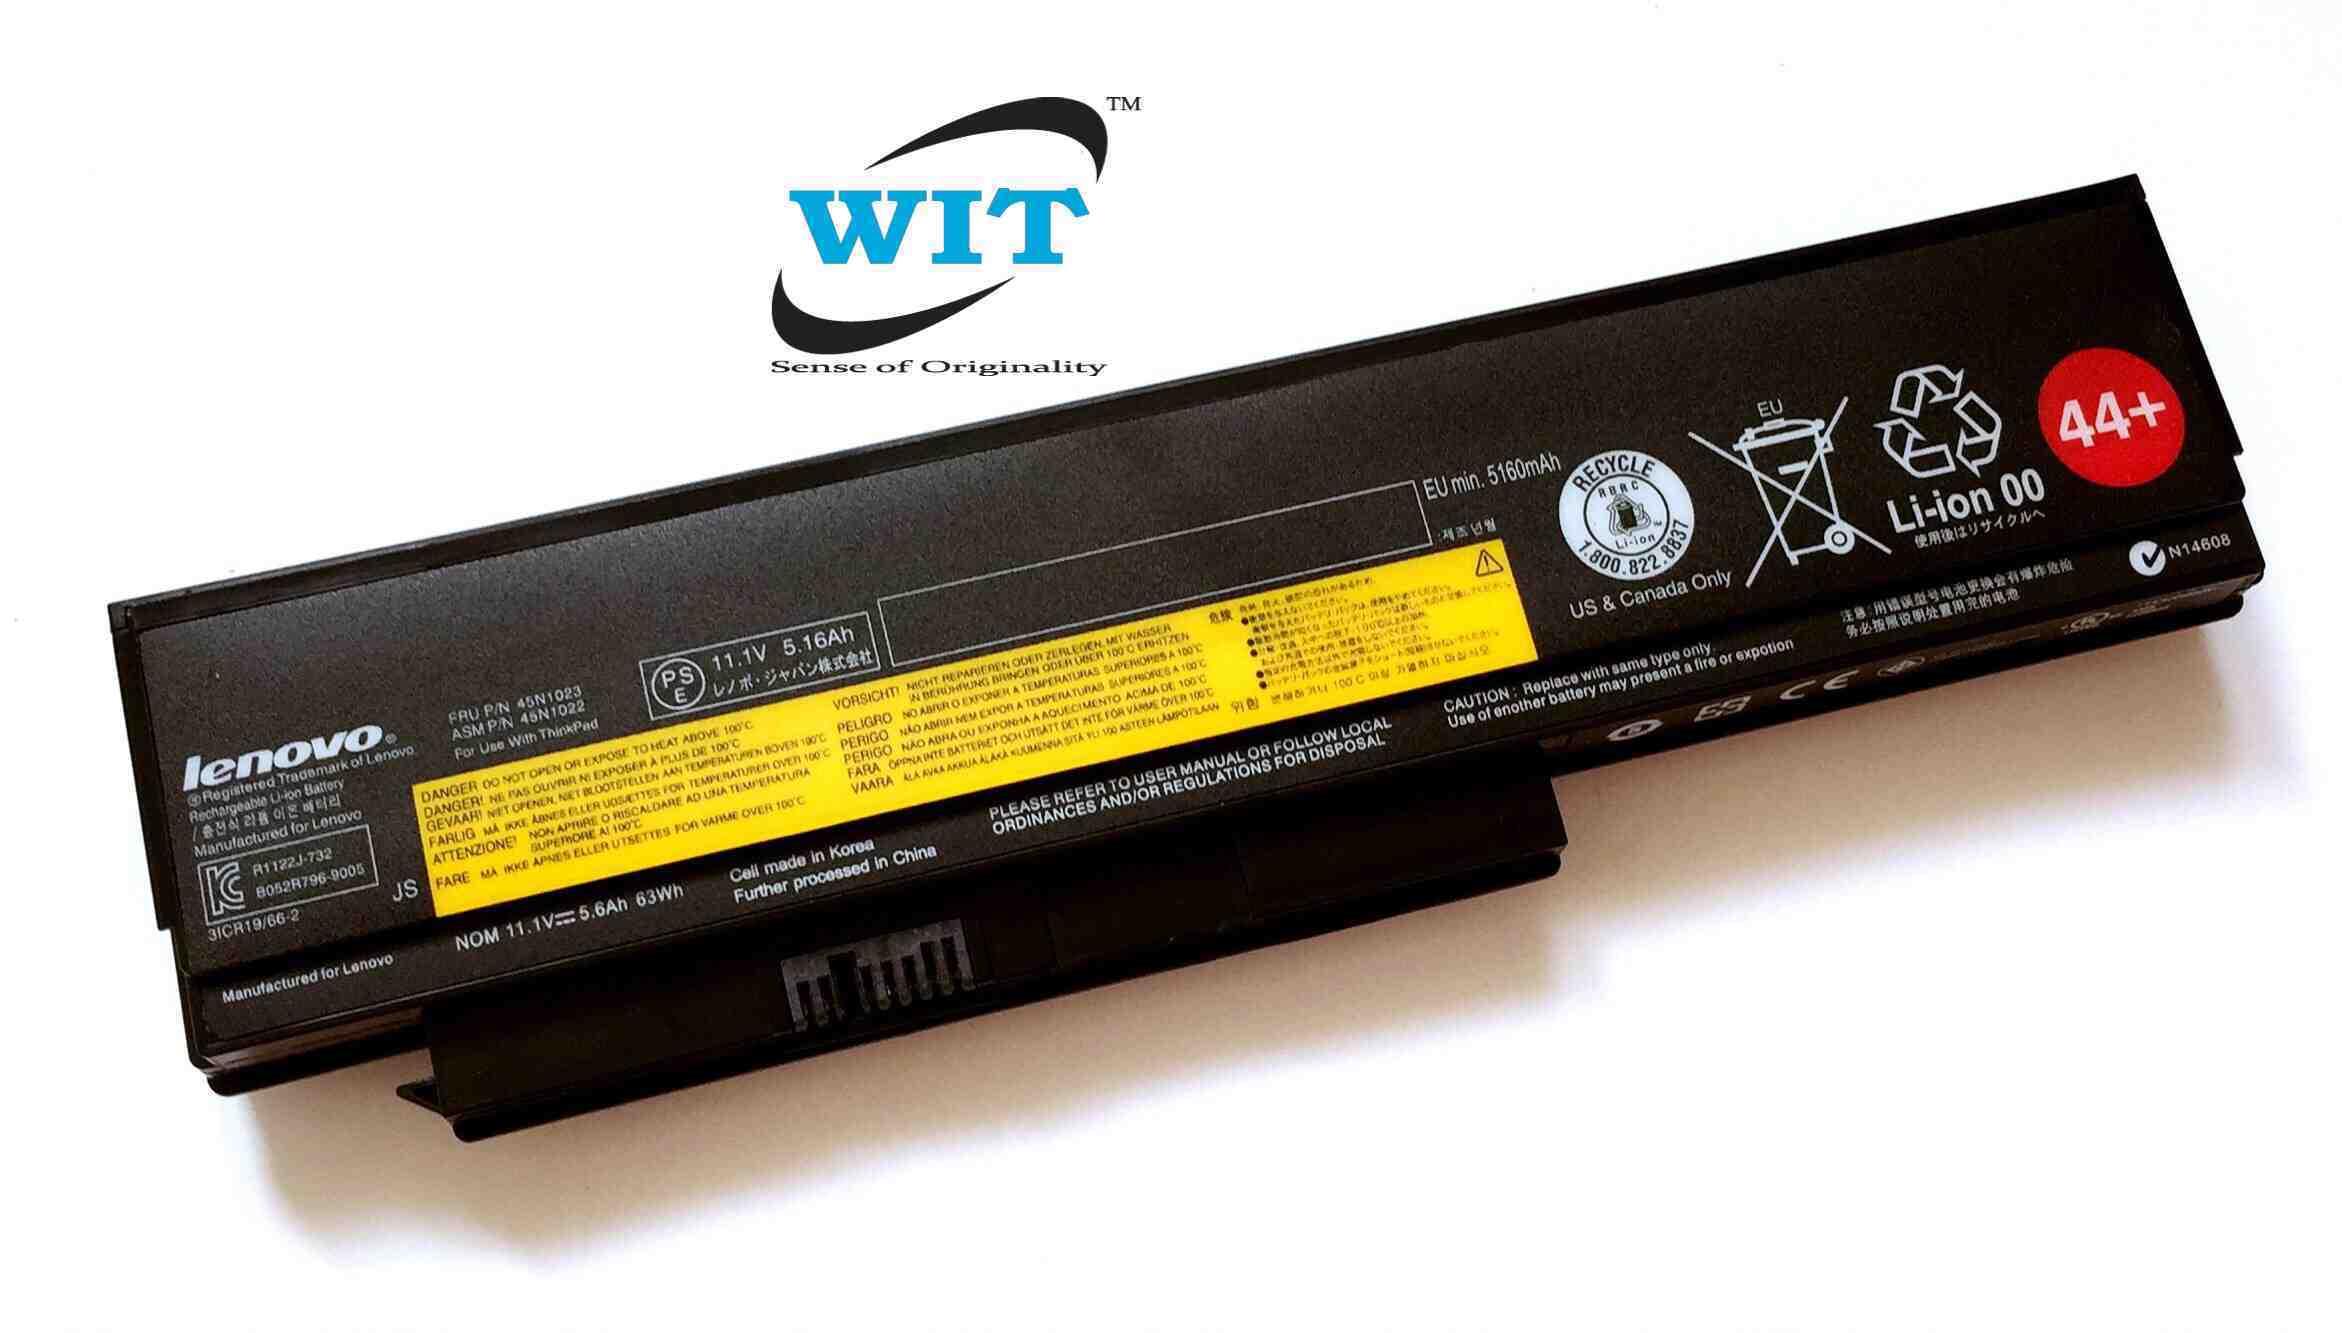 45n1023 42t4861 Original Oem 44 Battery For Lenovo Thinkpad X230 X230i X220 X220i 0a36306 45n1031 Wit Computers